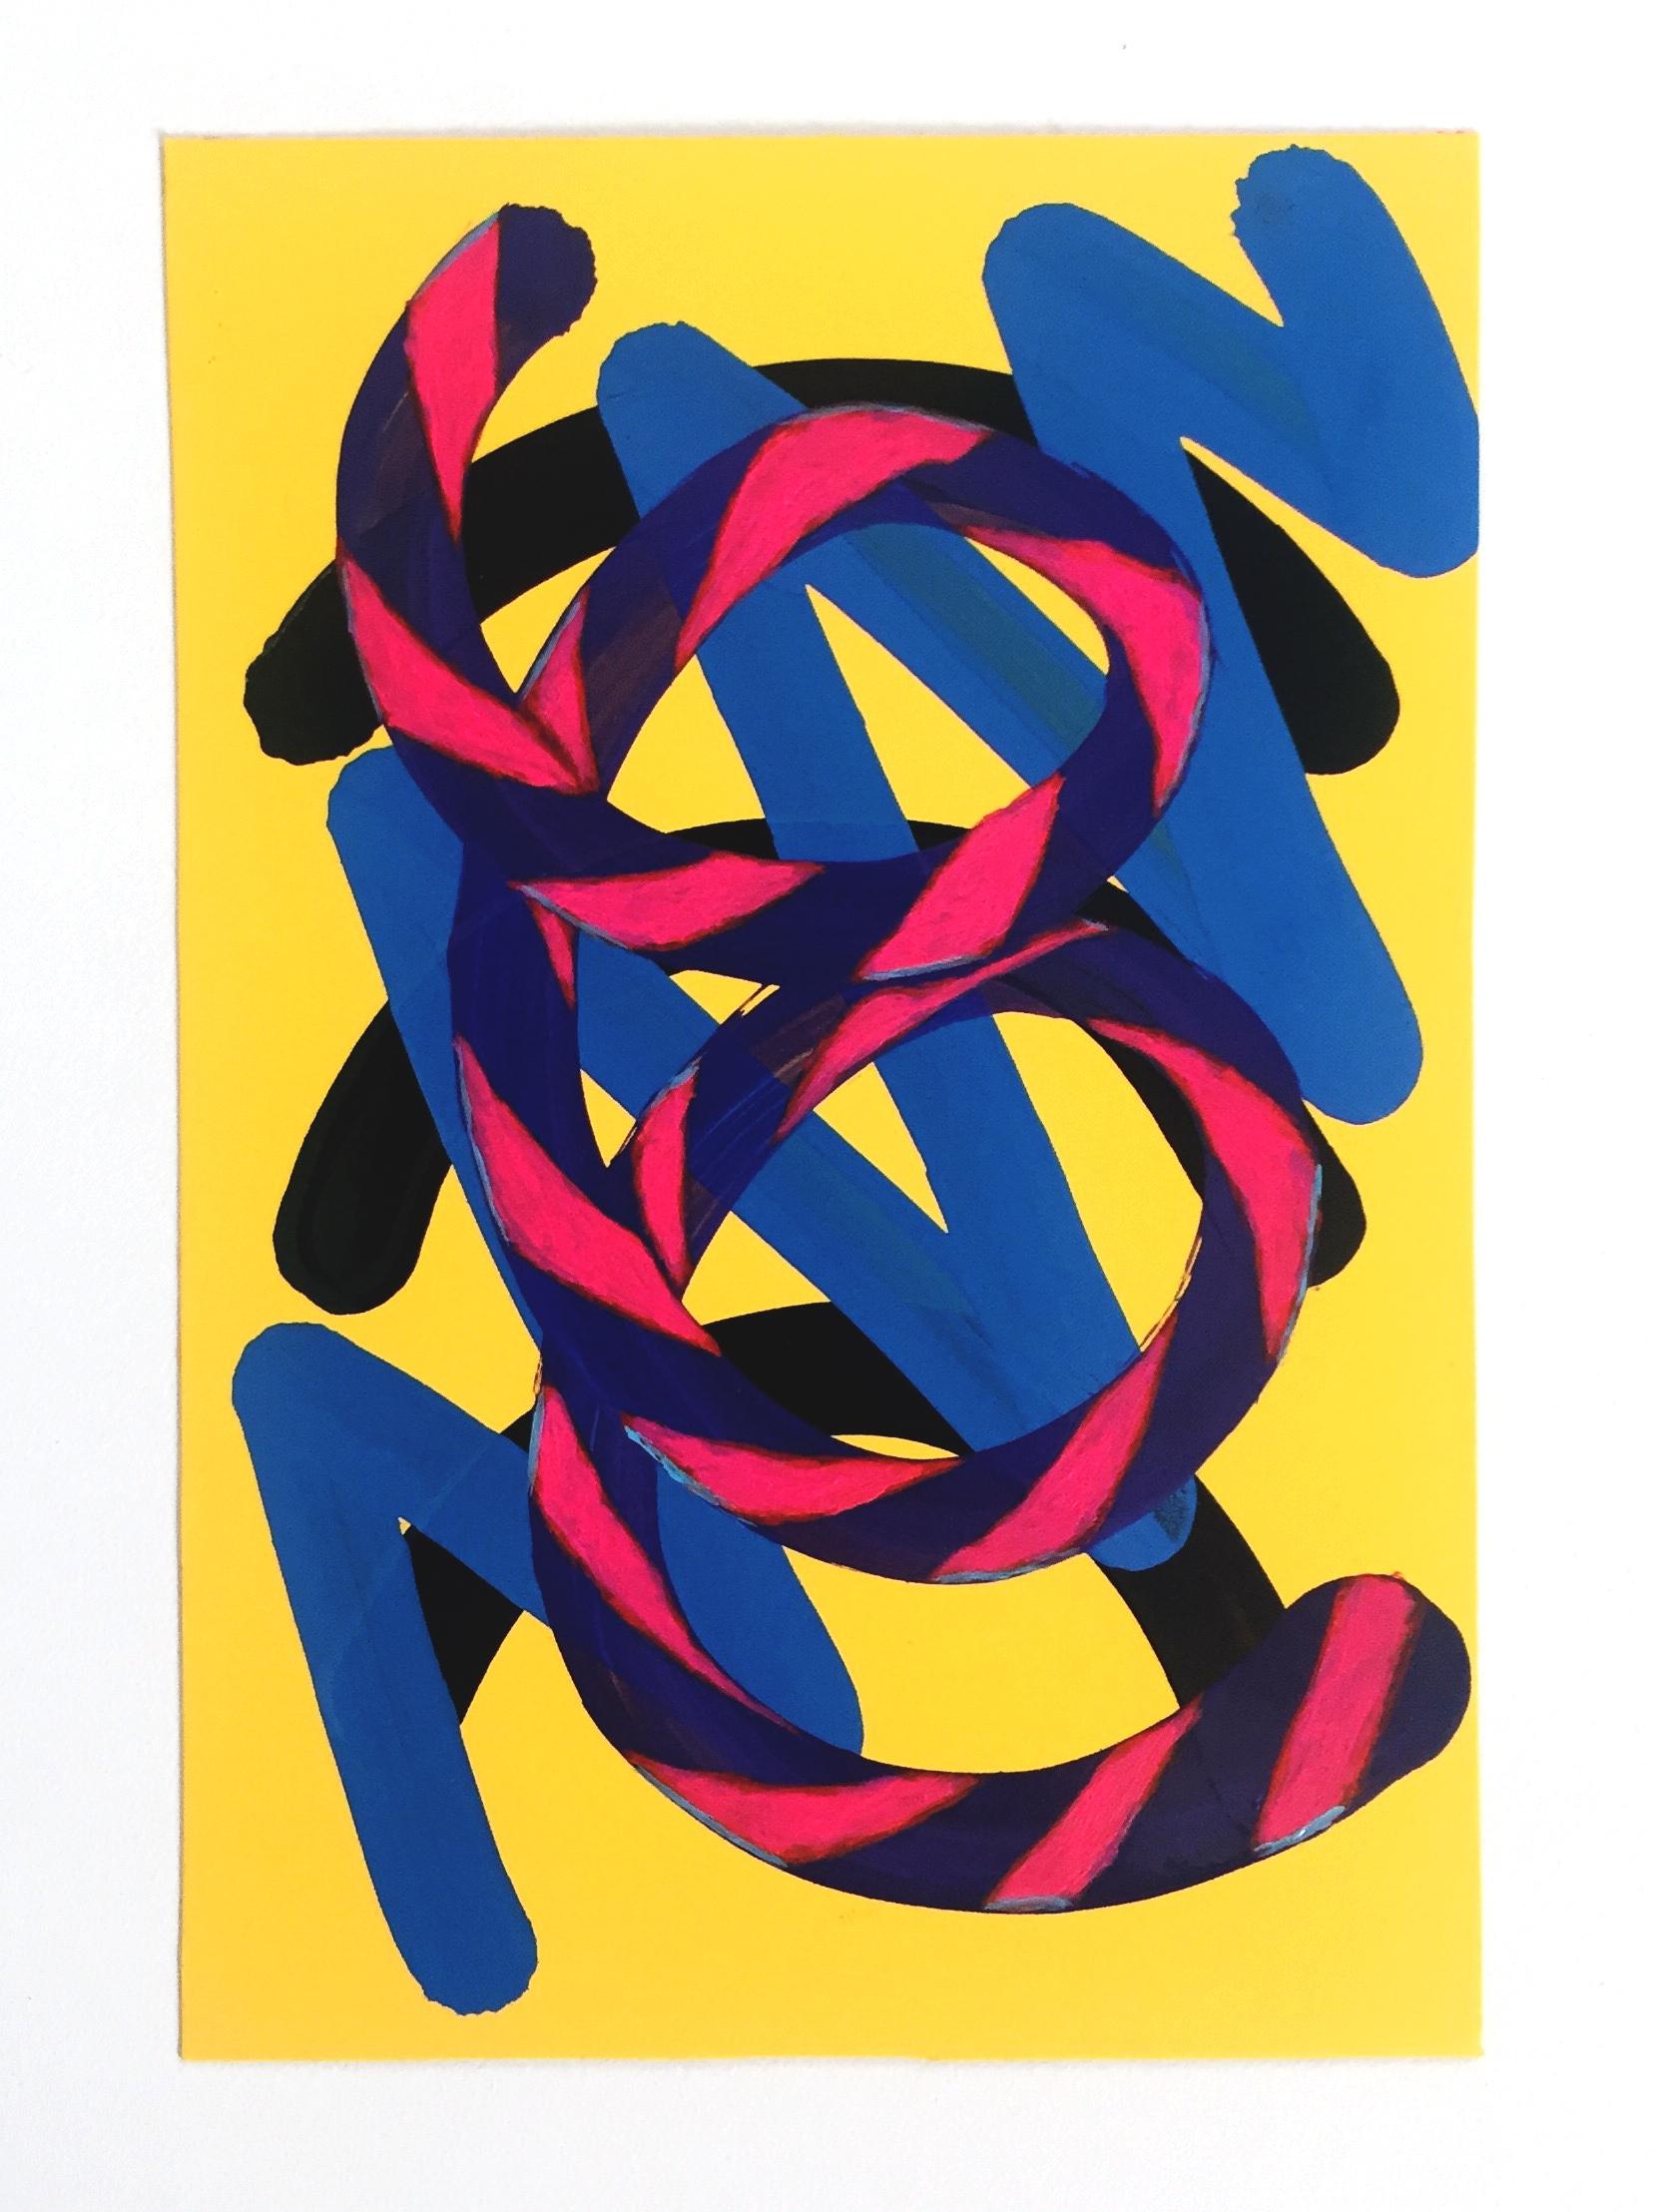 aesthetic, painting, contemporaryart - andrew_indelicato   ello